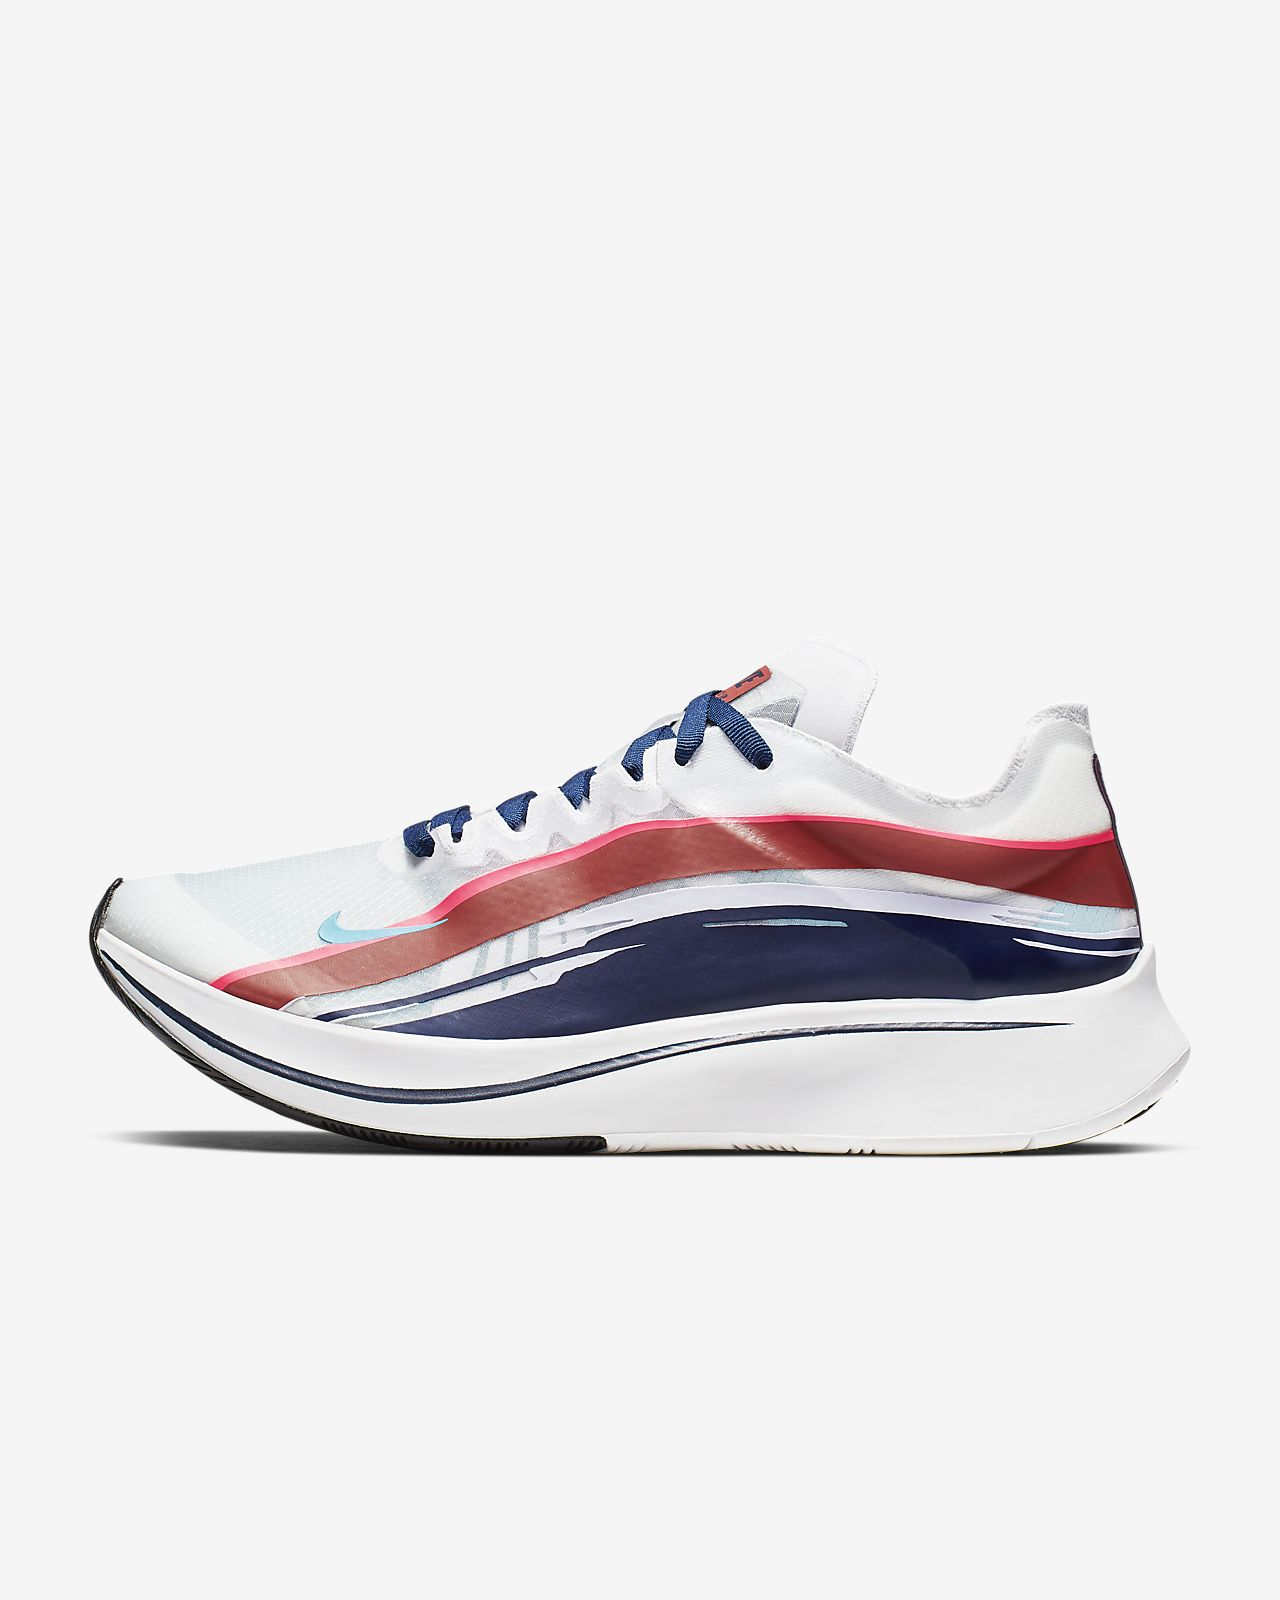 Nike Zoom Fly SP Women's Running Shoe